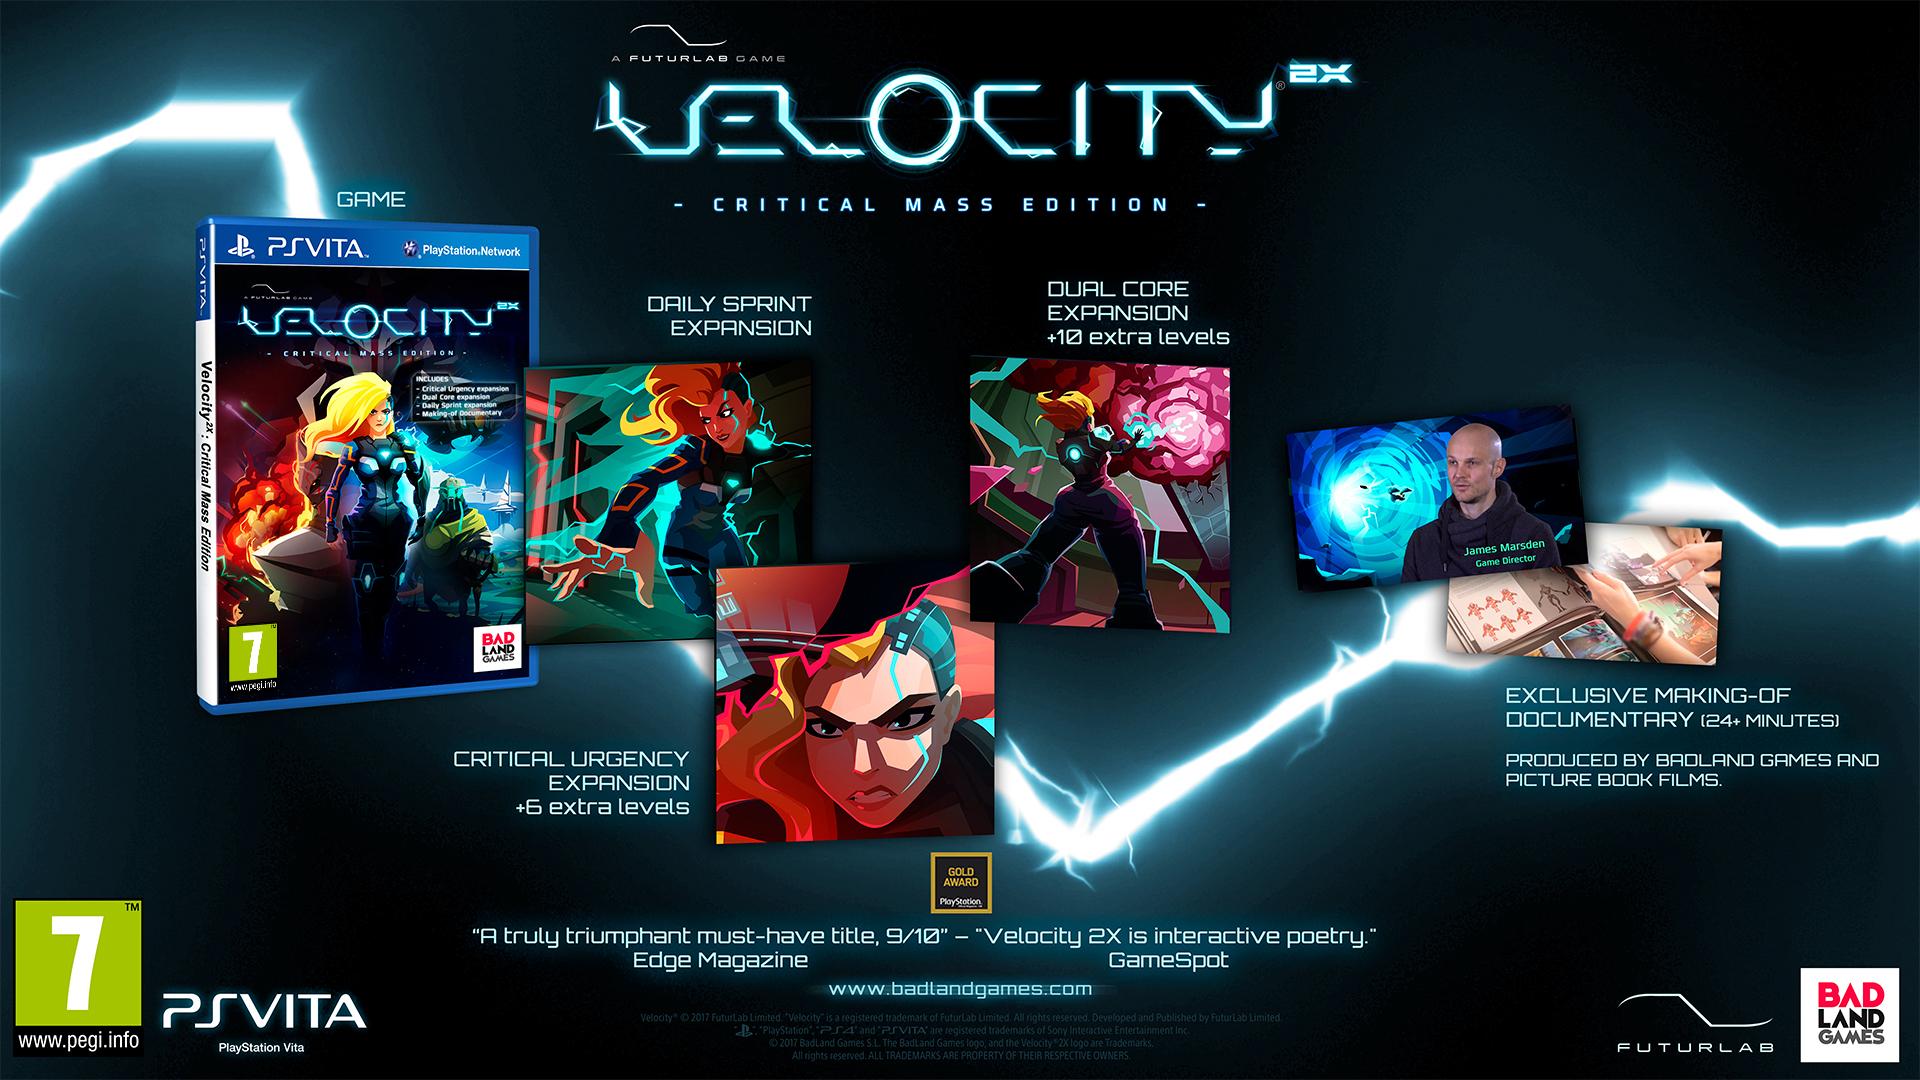 VELOCITY 2X CRITICAL MASS EDITIO 1